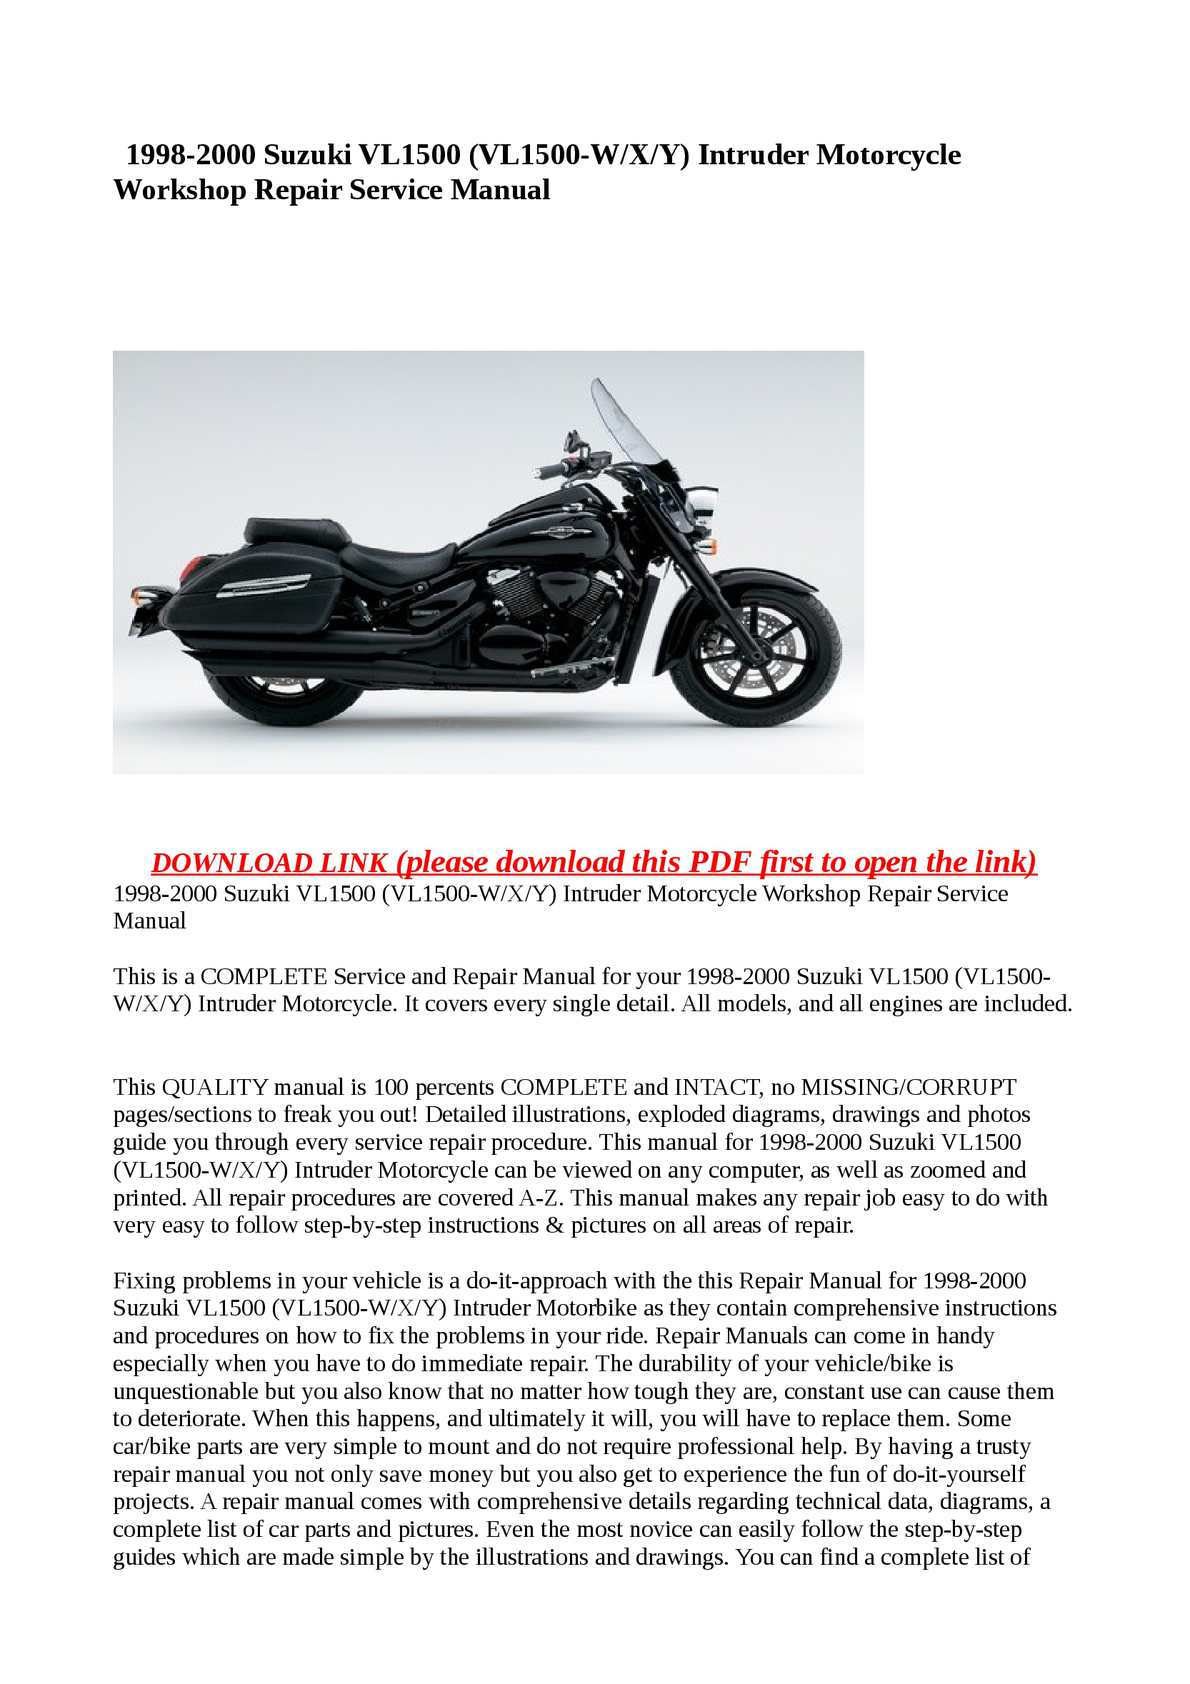 Calaméo - 1998-2000 Suzuki VL1500 (VL1500-W/X/Y) Intruder Motorcycle Workshop  Repair Service Manual